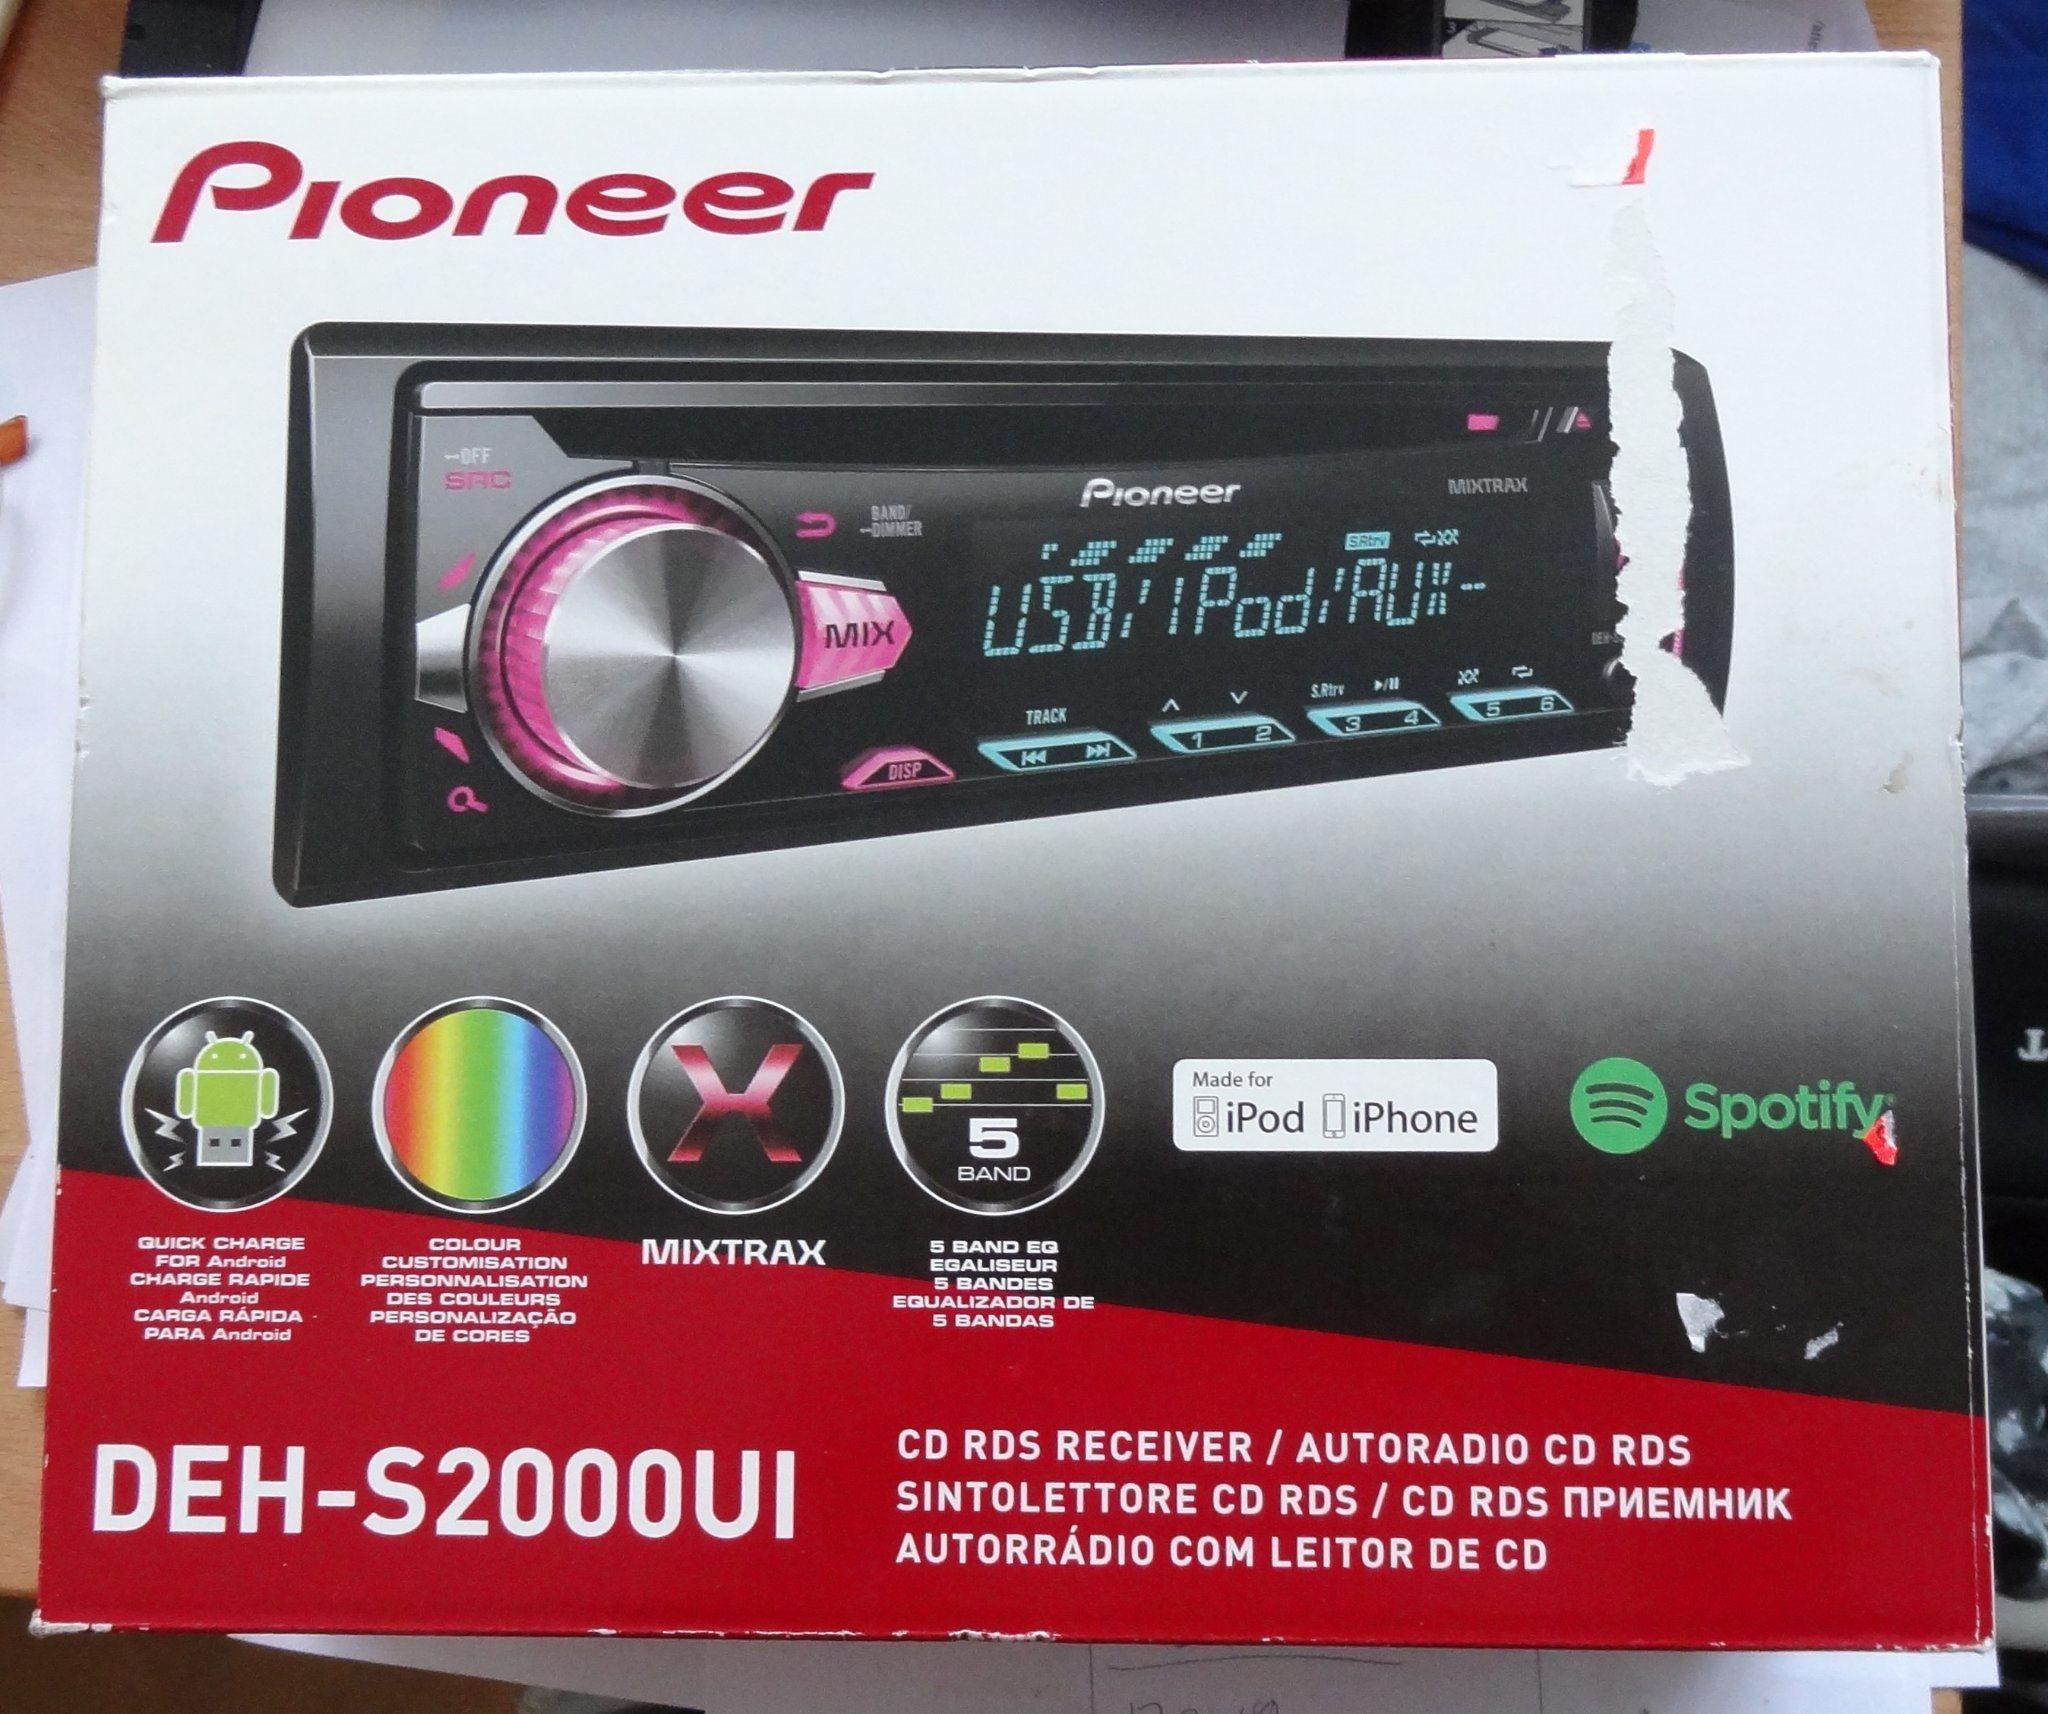 Bilstereo Pioneer DEH-S2000UI - USB - Iphone - .. (337894613) ᐈ Köp ... fde35da144e50